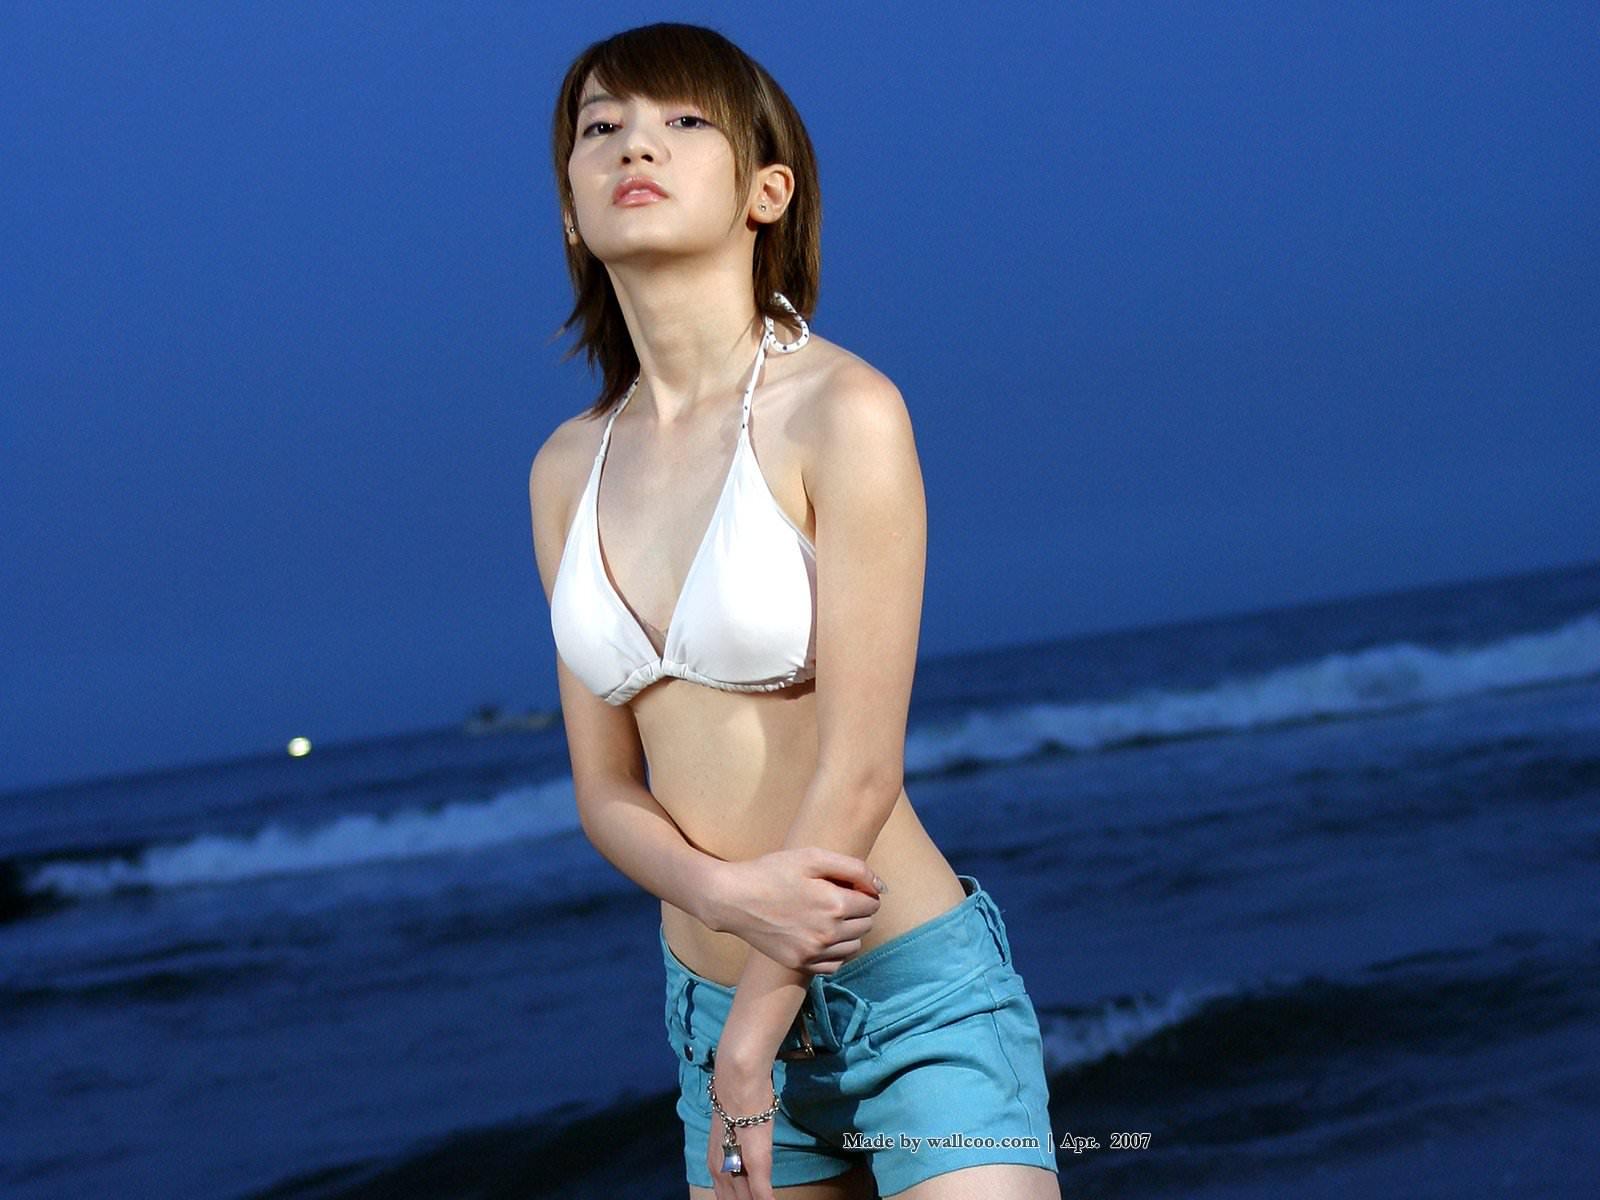 Японка в шортах фото 20 фотография